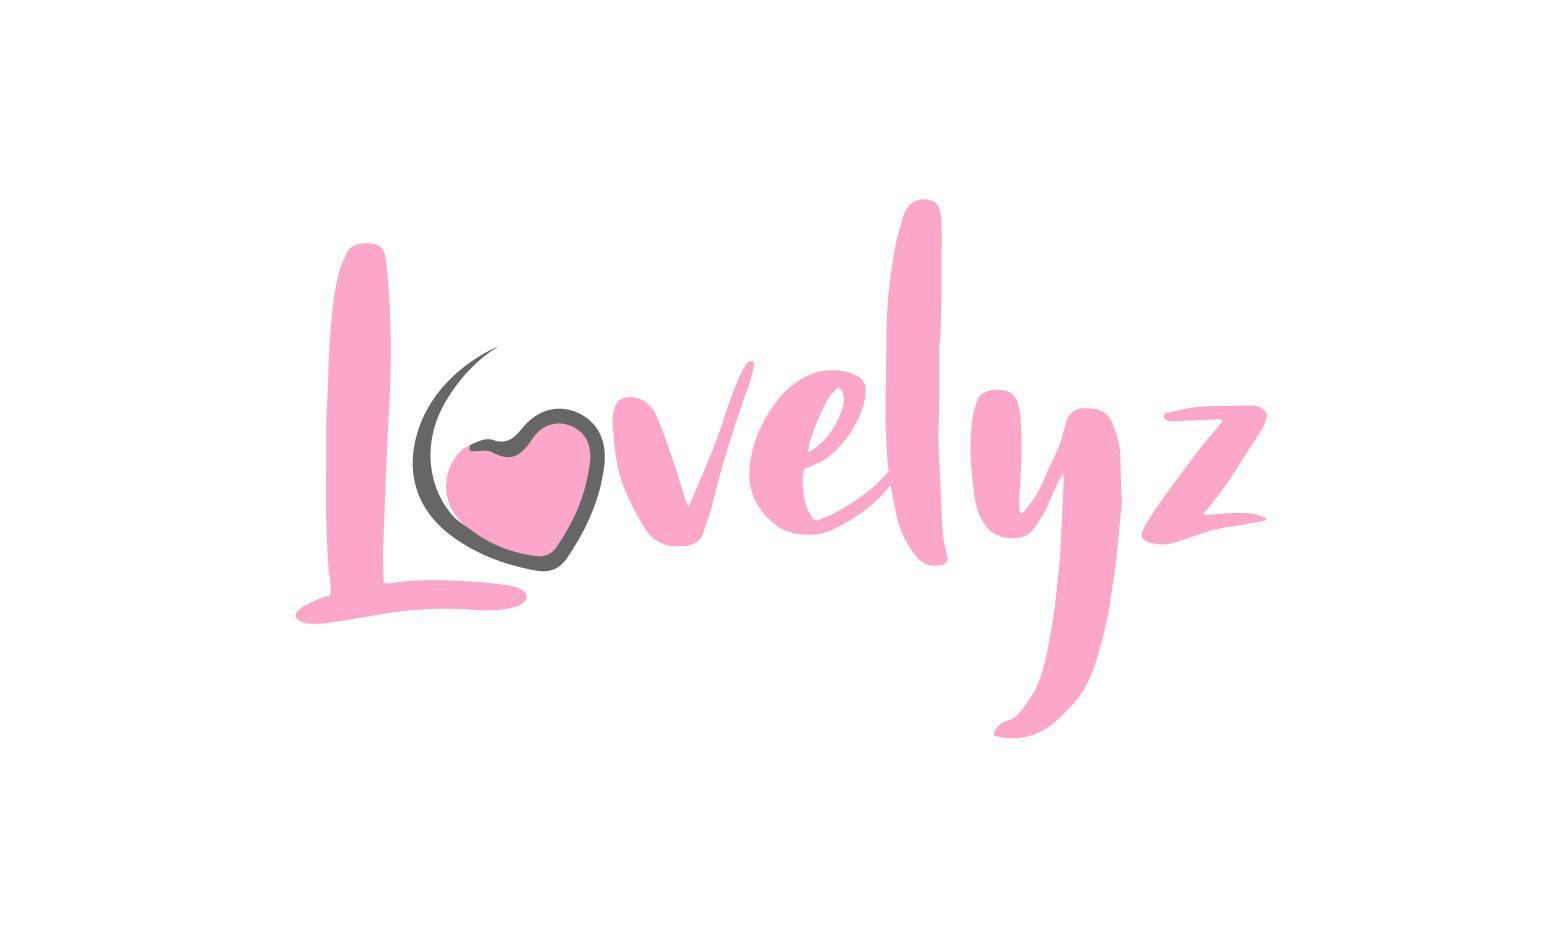 Lovelyz.com